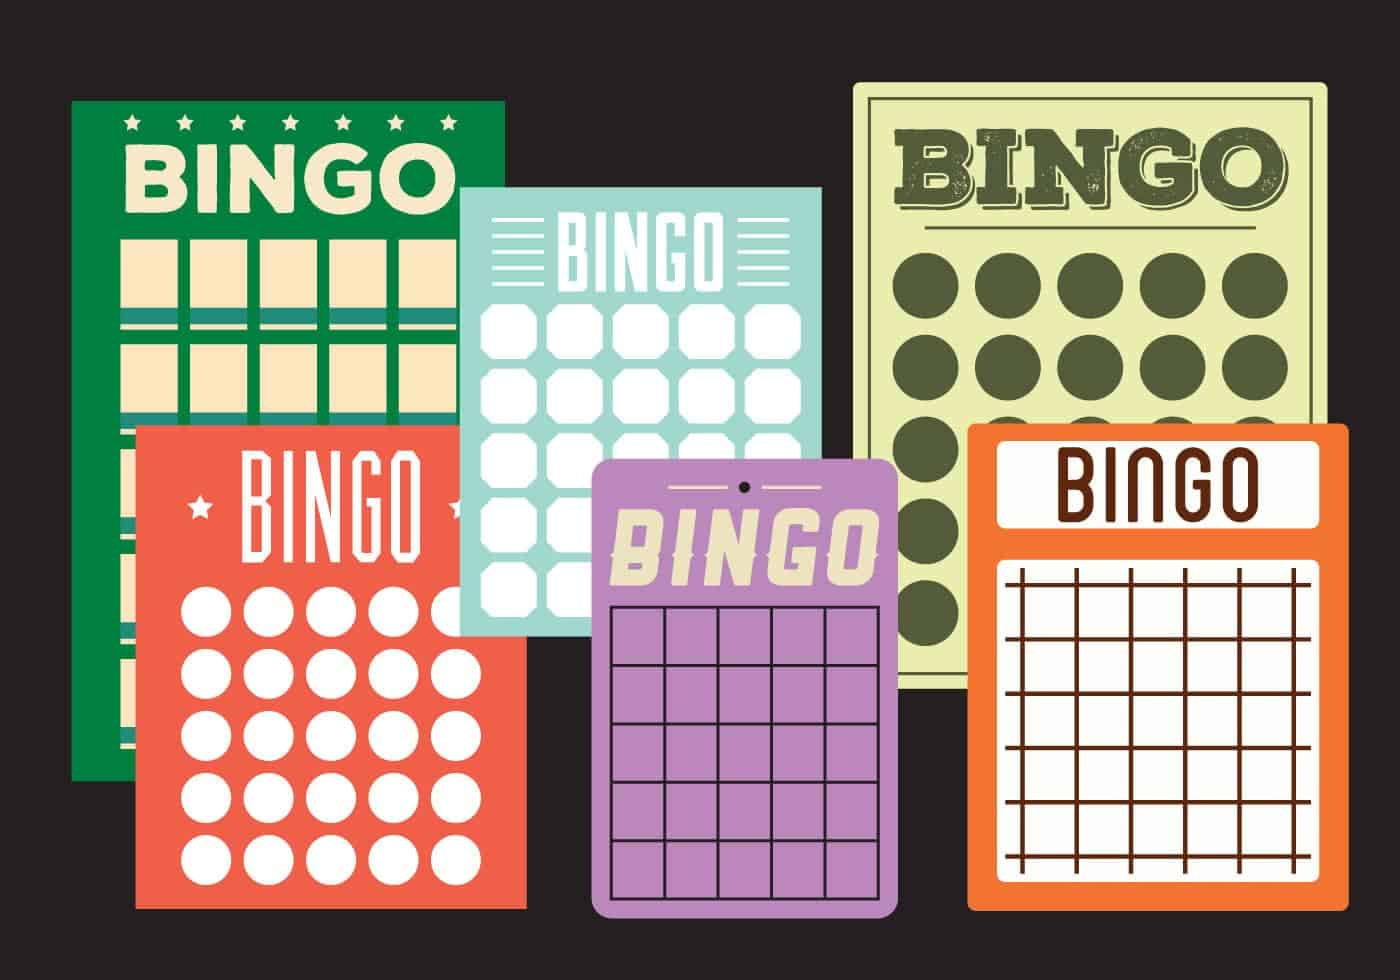 bảng chơi bingo